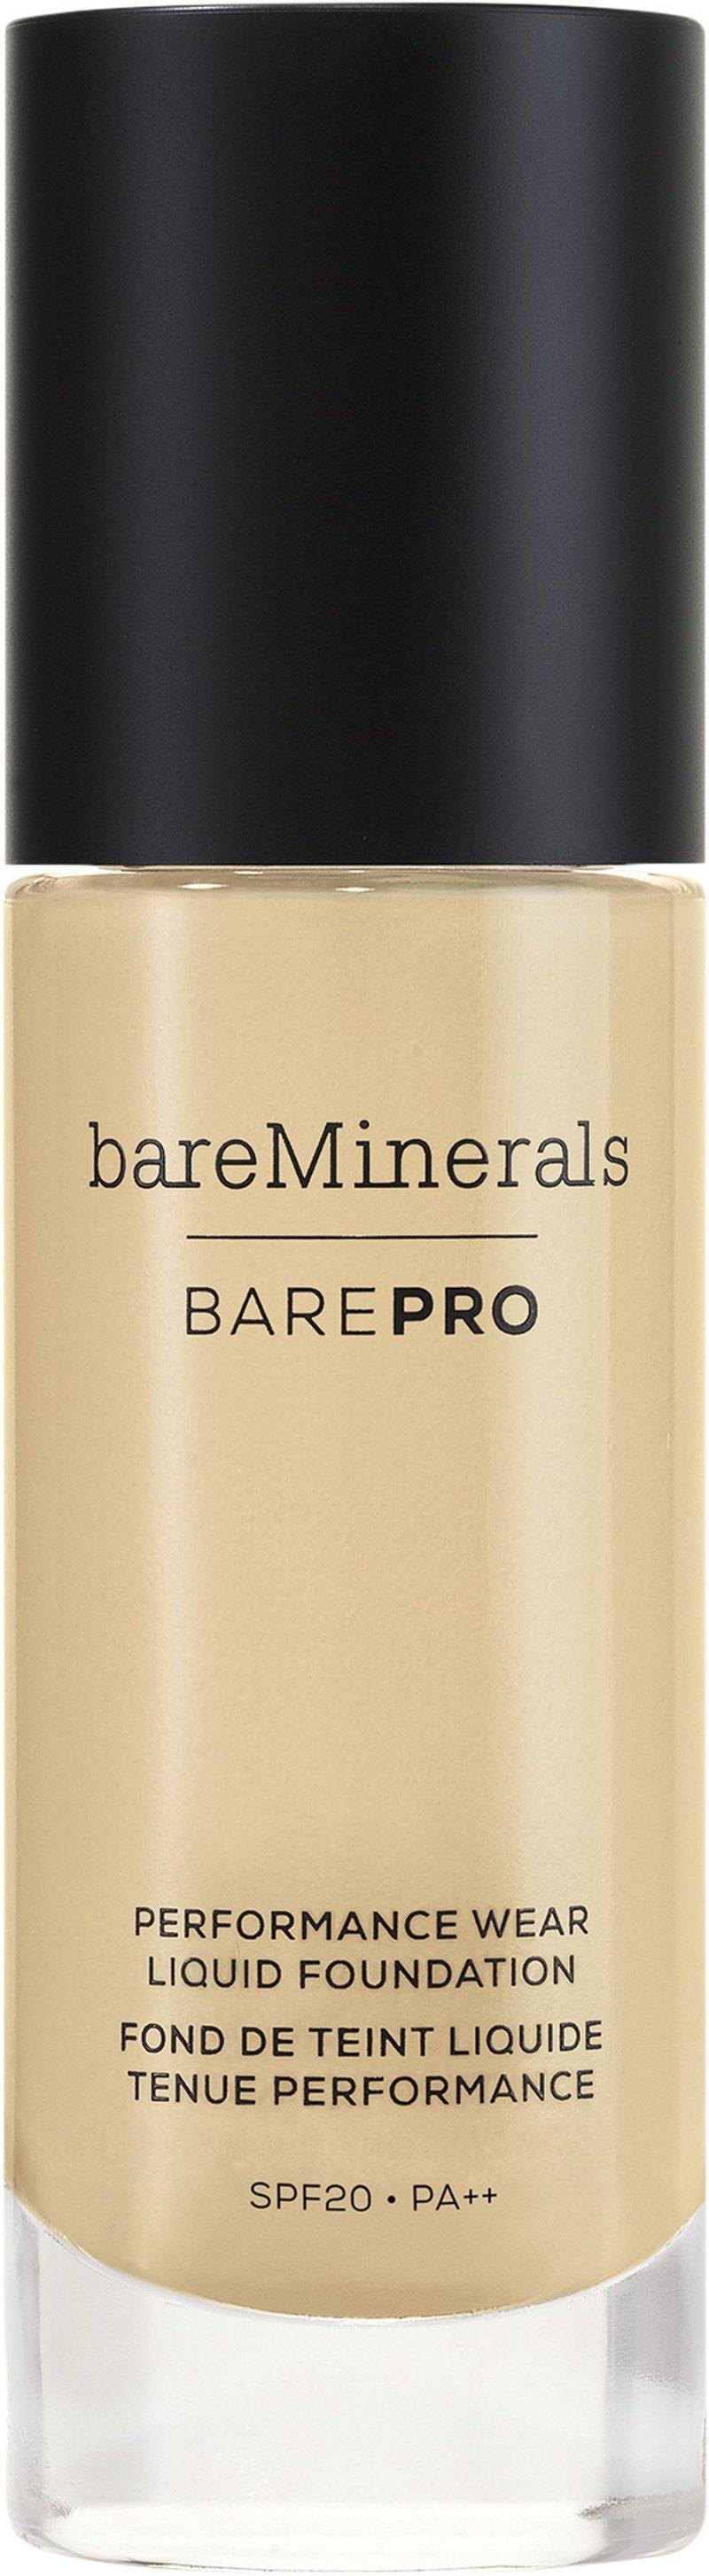 Image of   Bareminerals Foundation - Barepro Performance Wear Liquid - Dawn 02